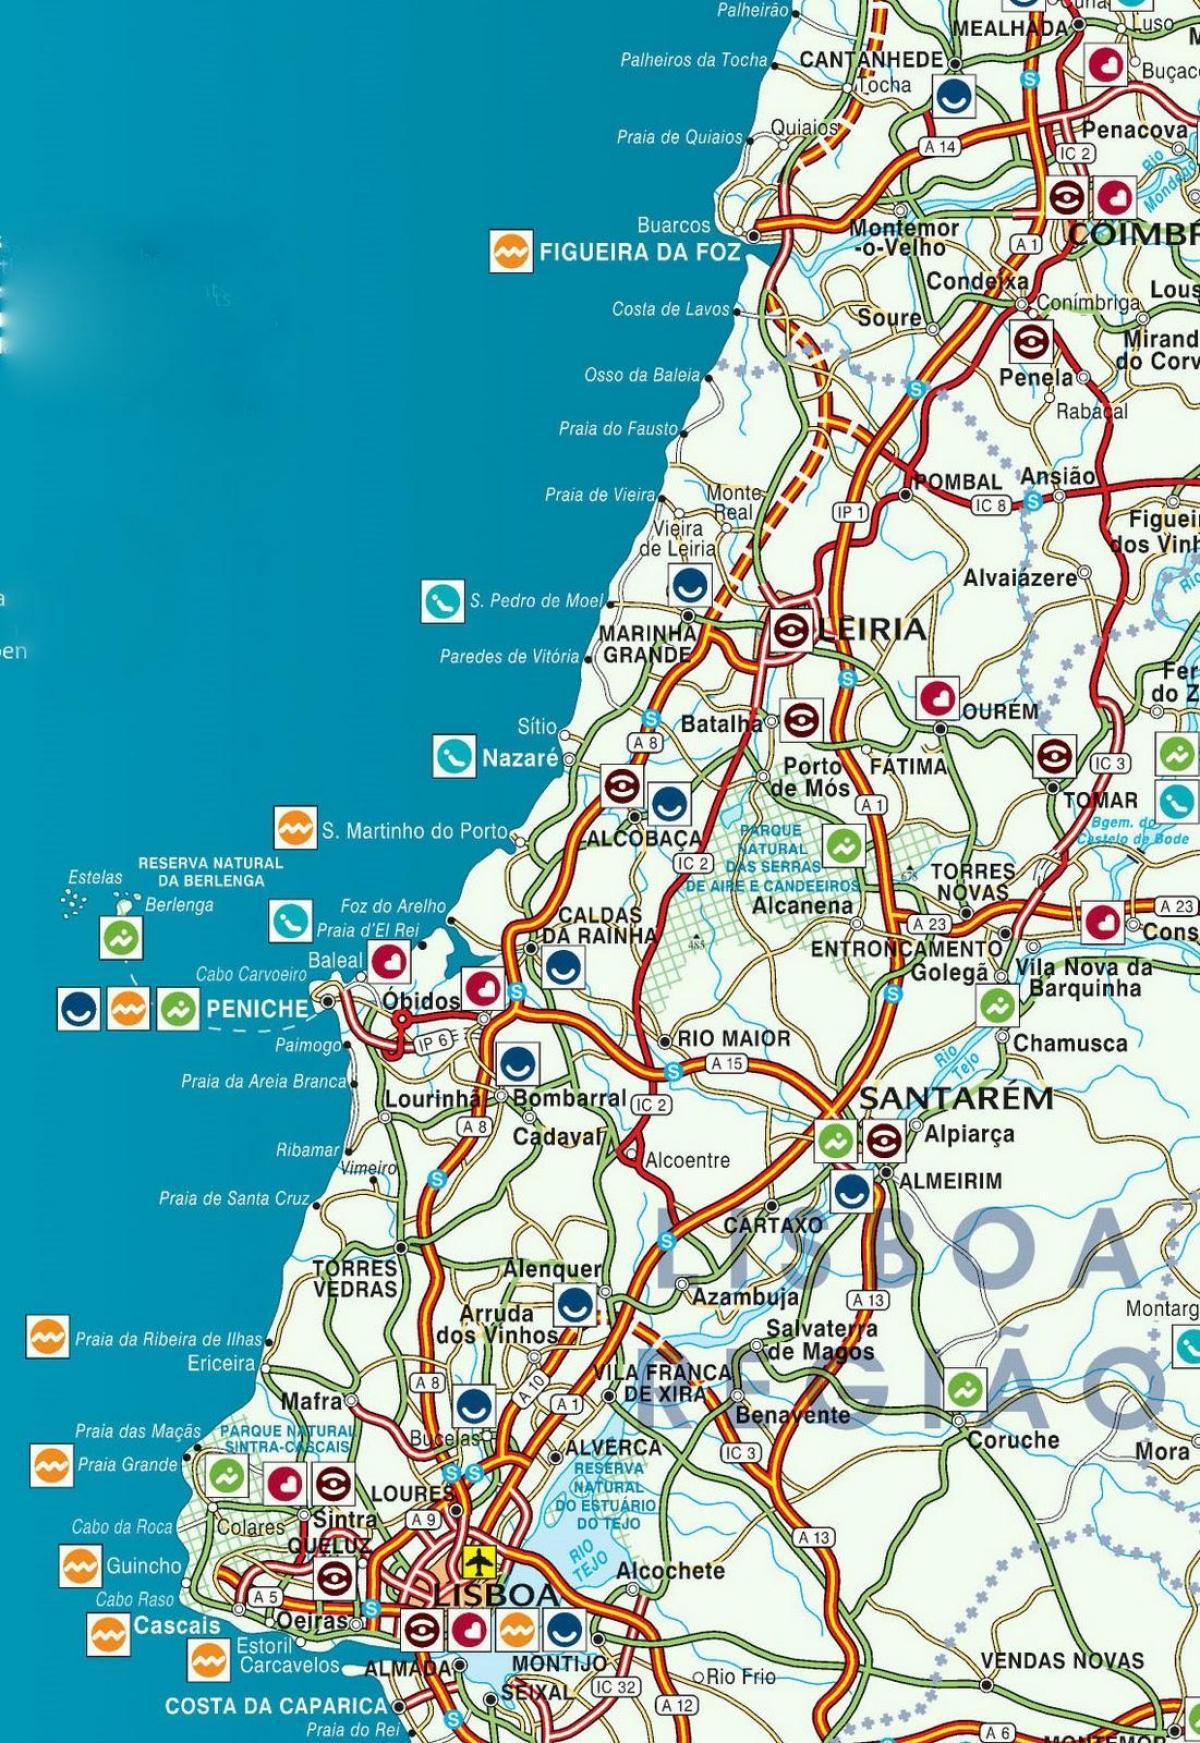 mapa da costa de prata portugal Costa de prata de Portugal mapa   Mapa de Portugal, costa de Prata  mapa da costa de prata portugal